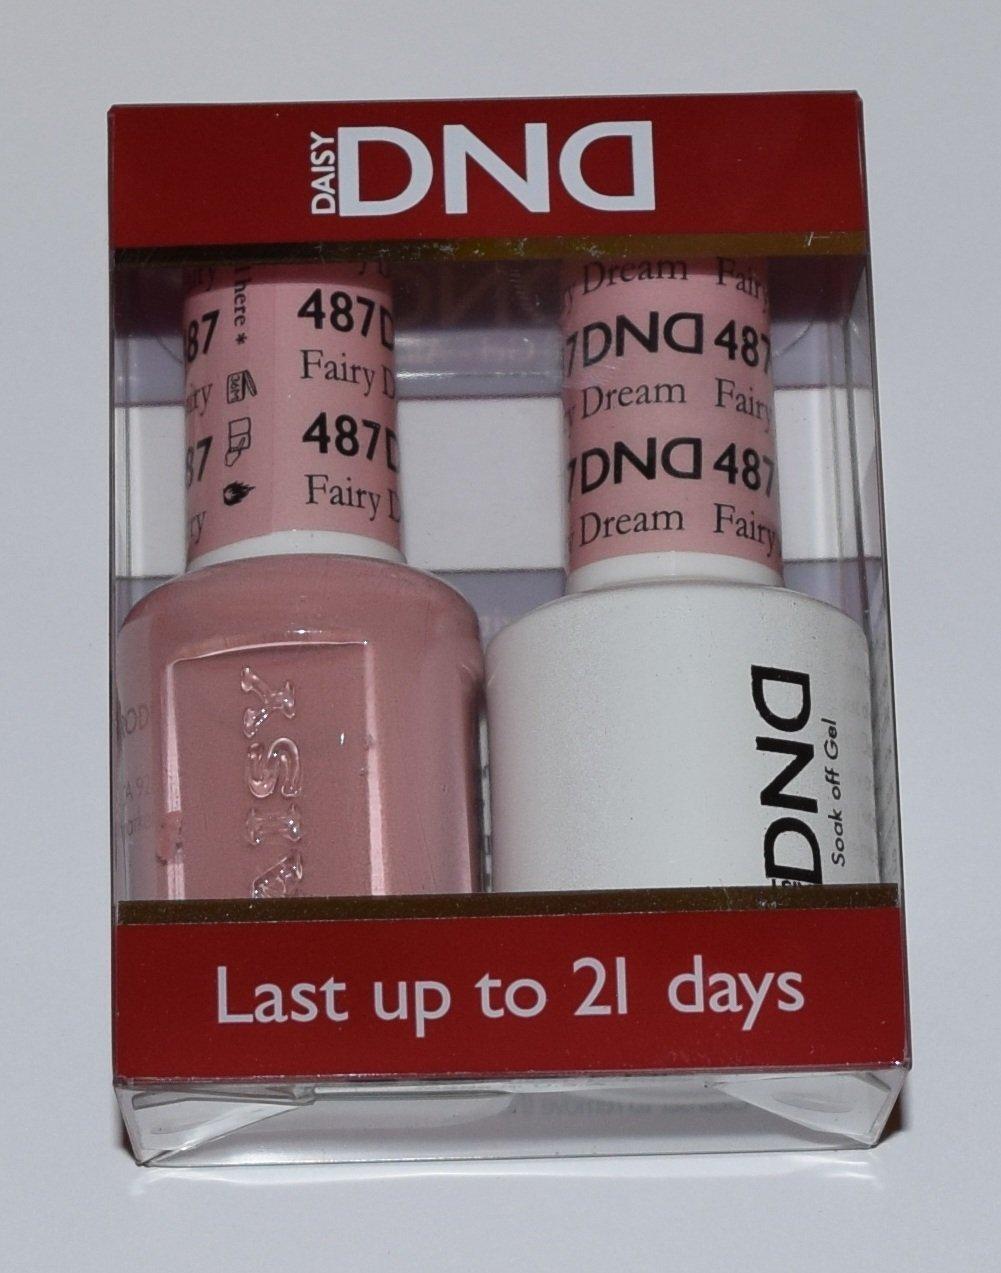 Amazon.com: DND Gel & Matching Polish Set #487 - Fairy Dream + 1 ...